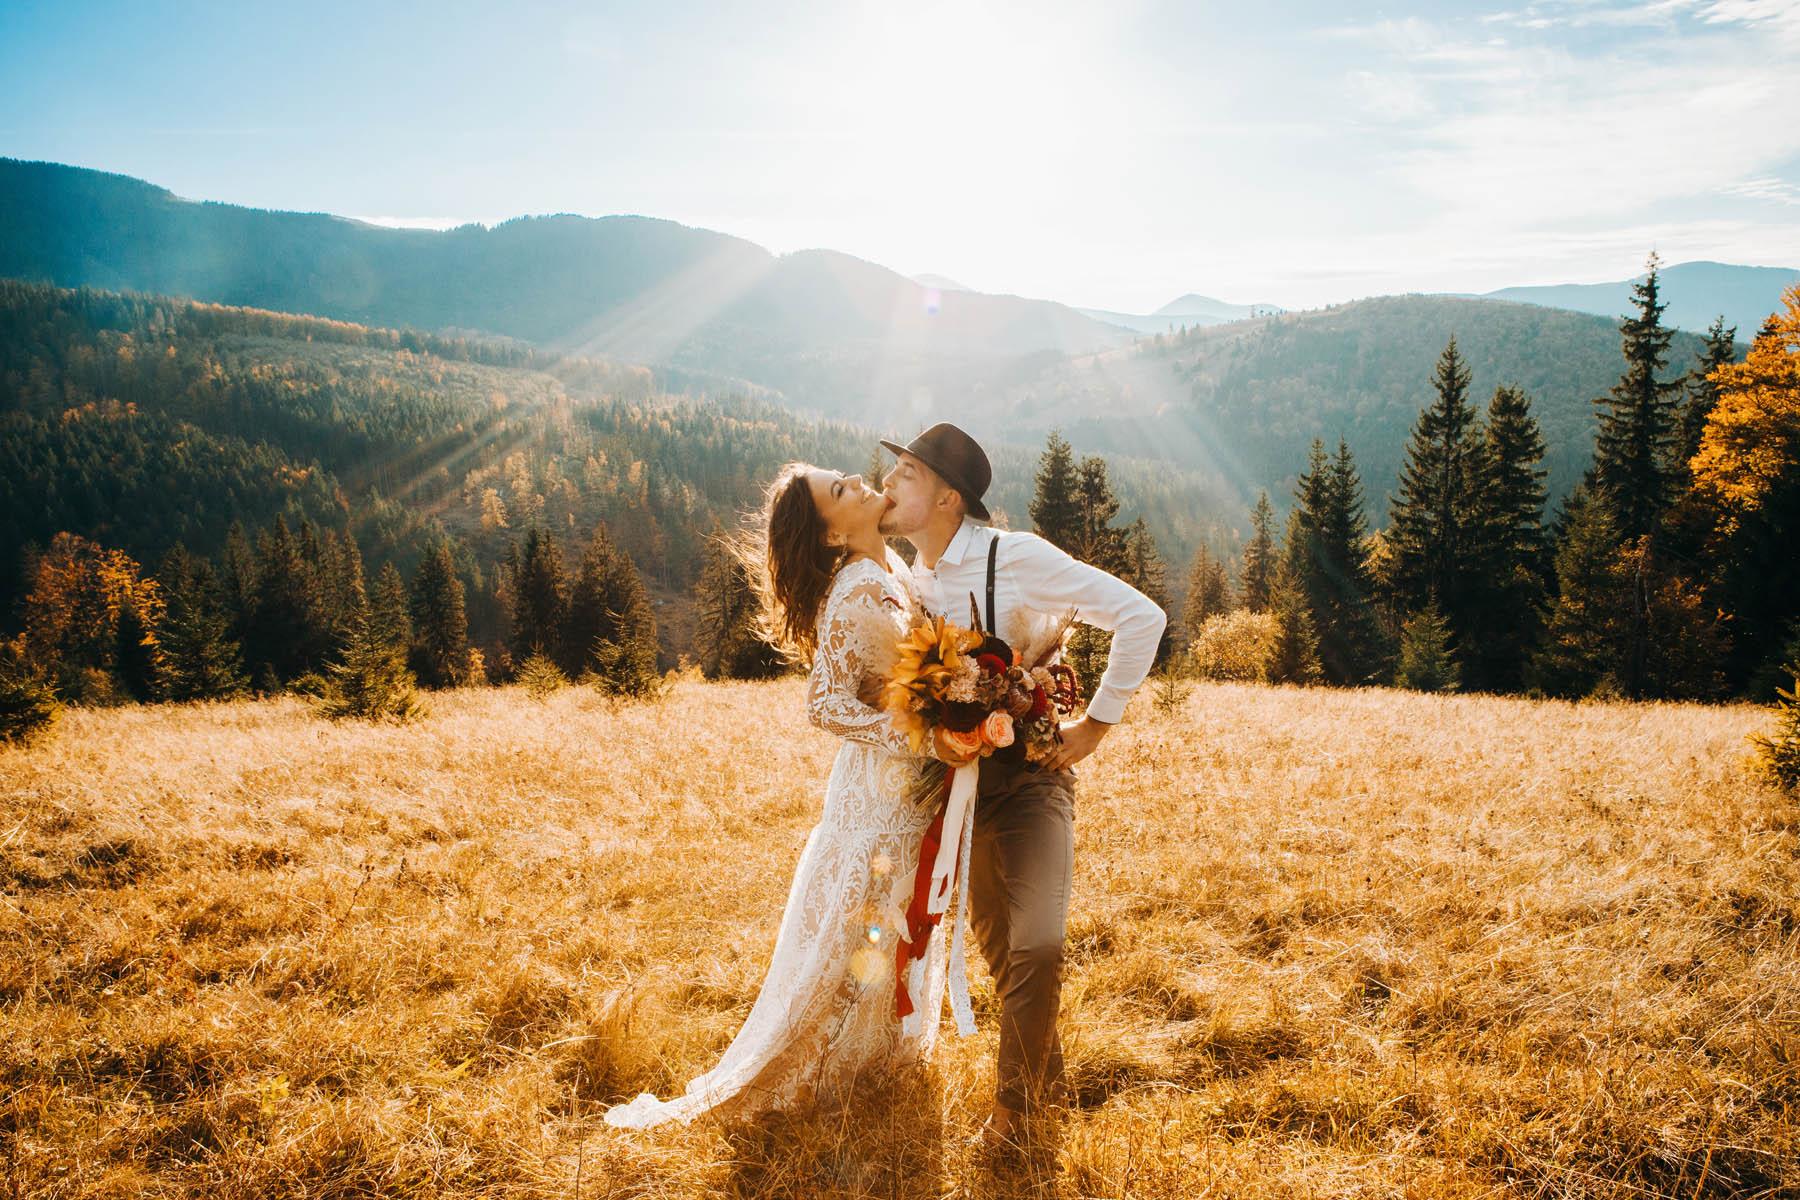 dating relativ geologic fete republica moldova pentru casatorie